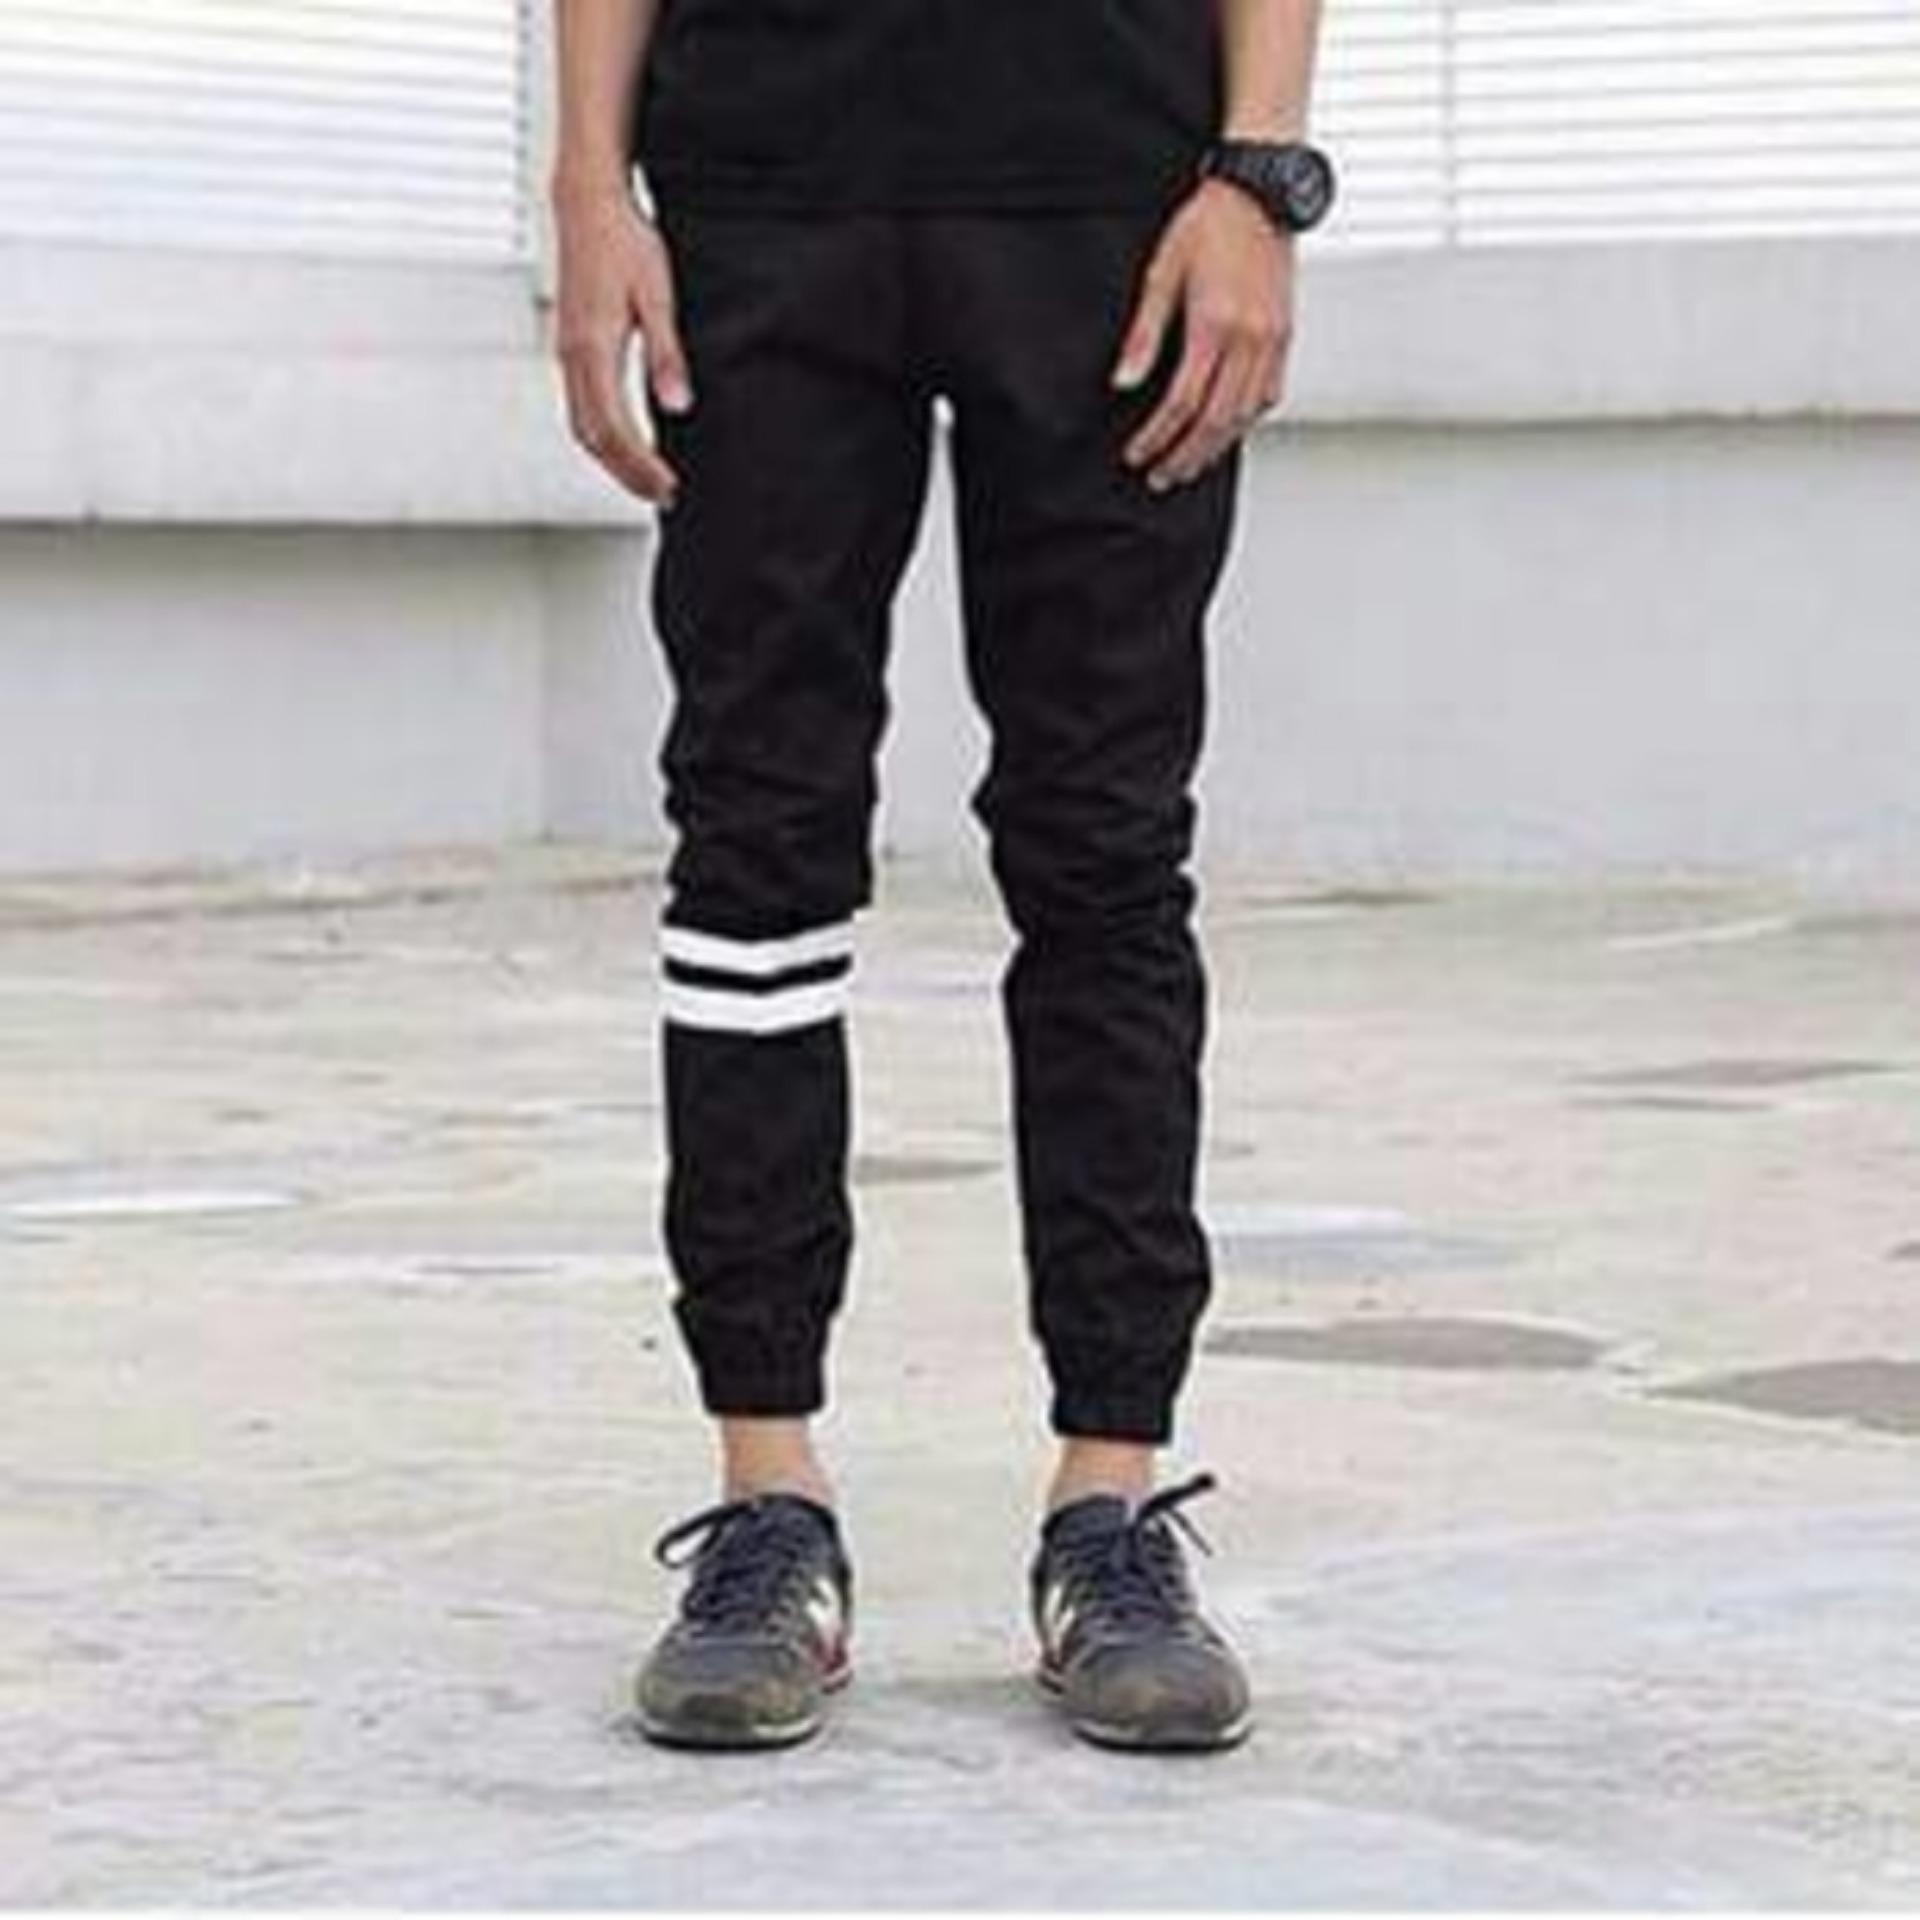 Beli Ispro Celana Pria Jogger Pants Hitam Strip Bestseller Cicilan